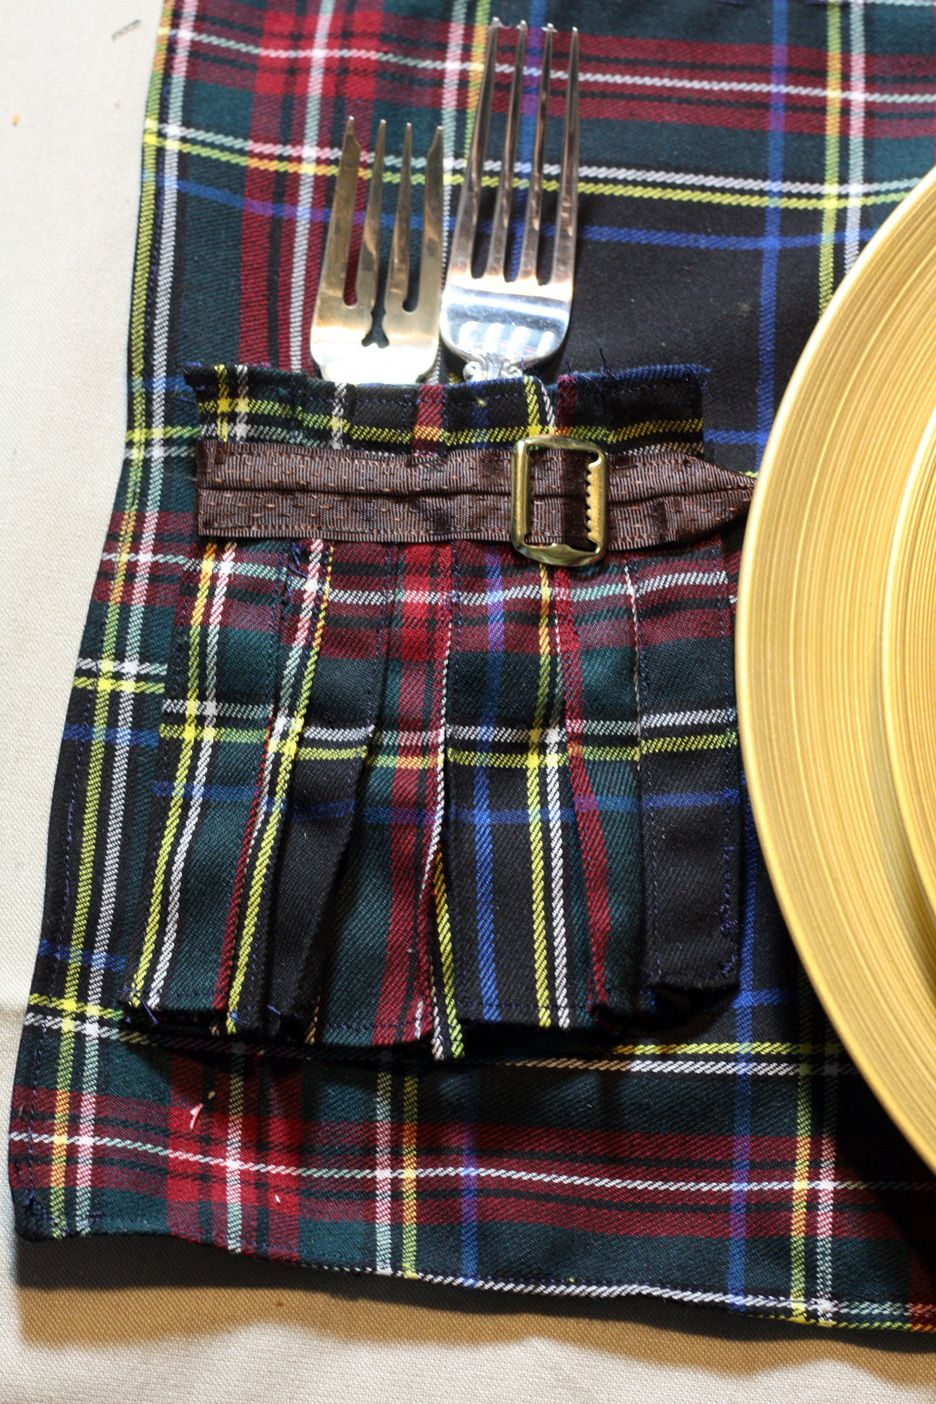 Fudge Ripple Scottish Kilt Placemats In The Craft Room Scottish Decor Tartan Christmas Scottish Kilts